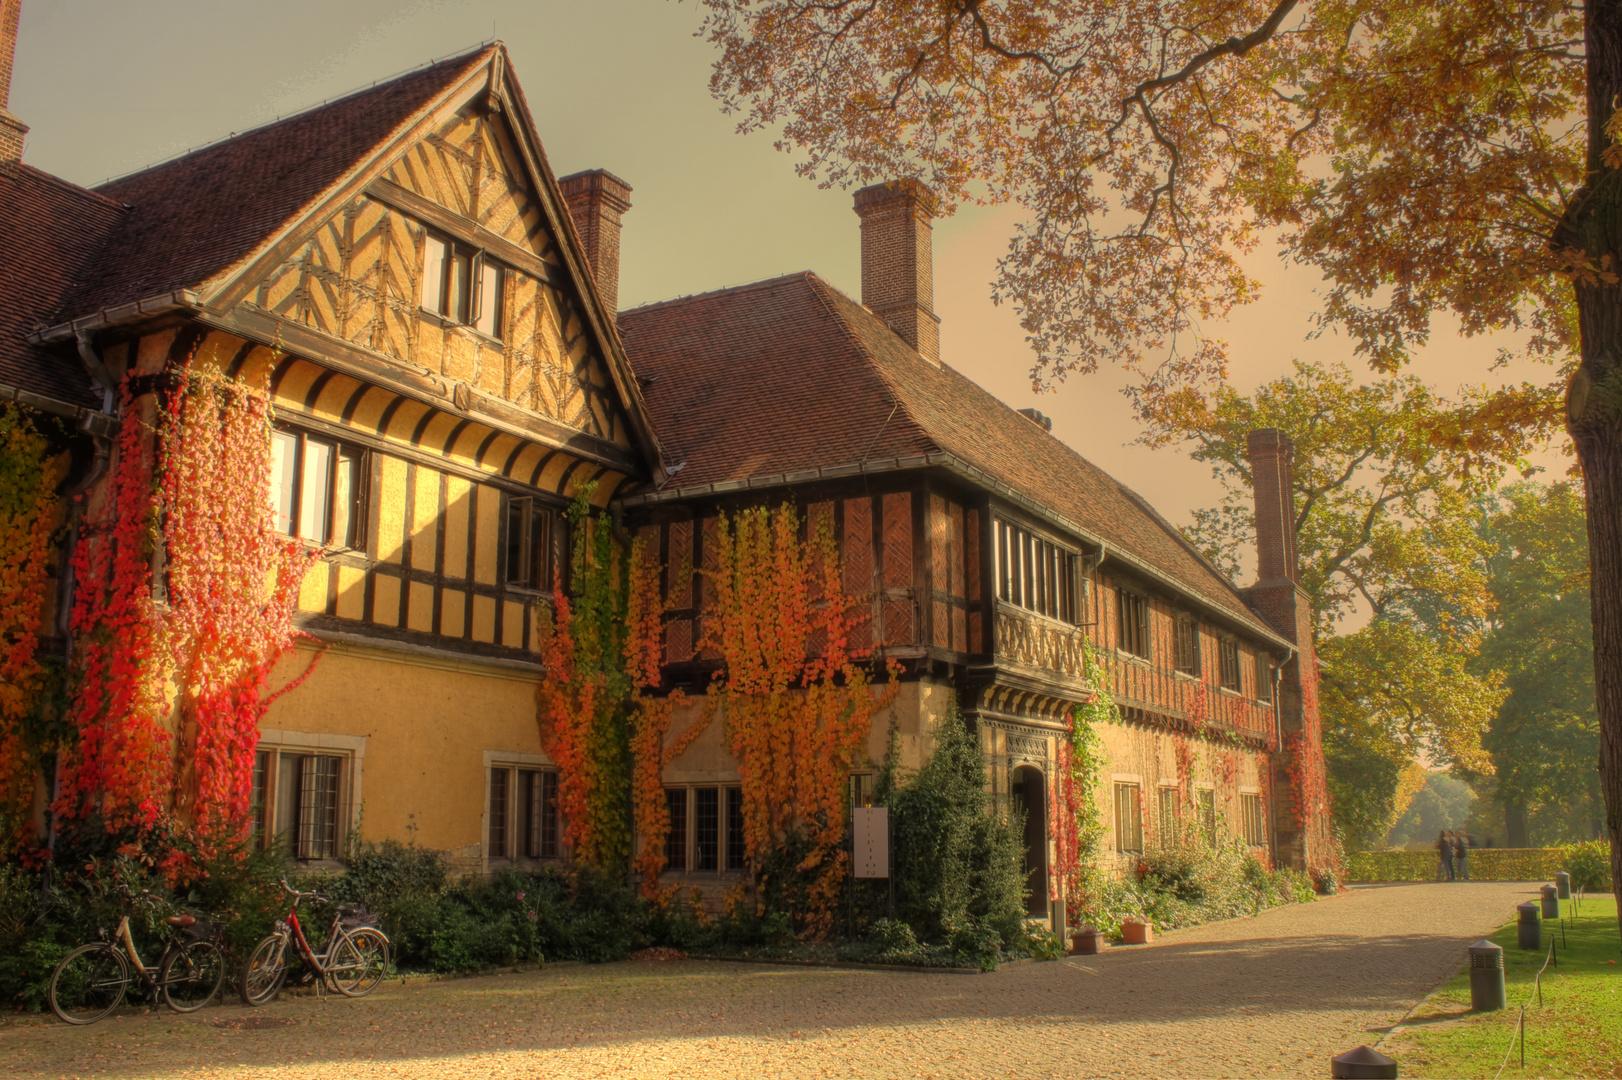 schloss cecilienhof in Potsdam